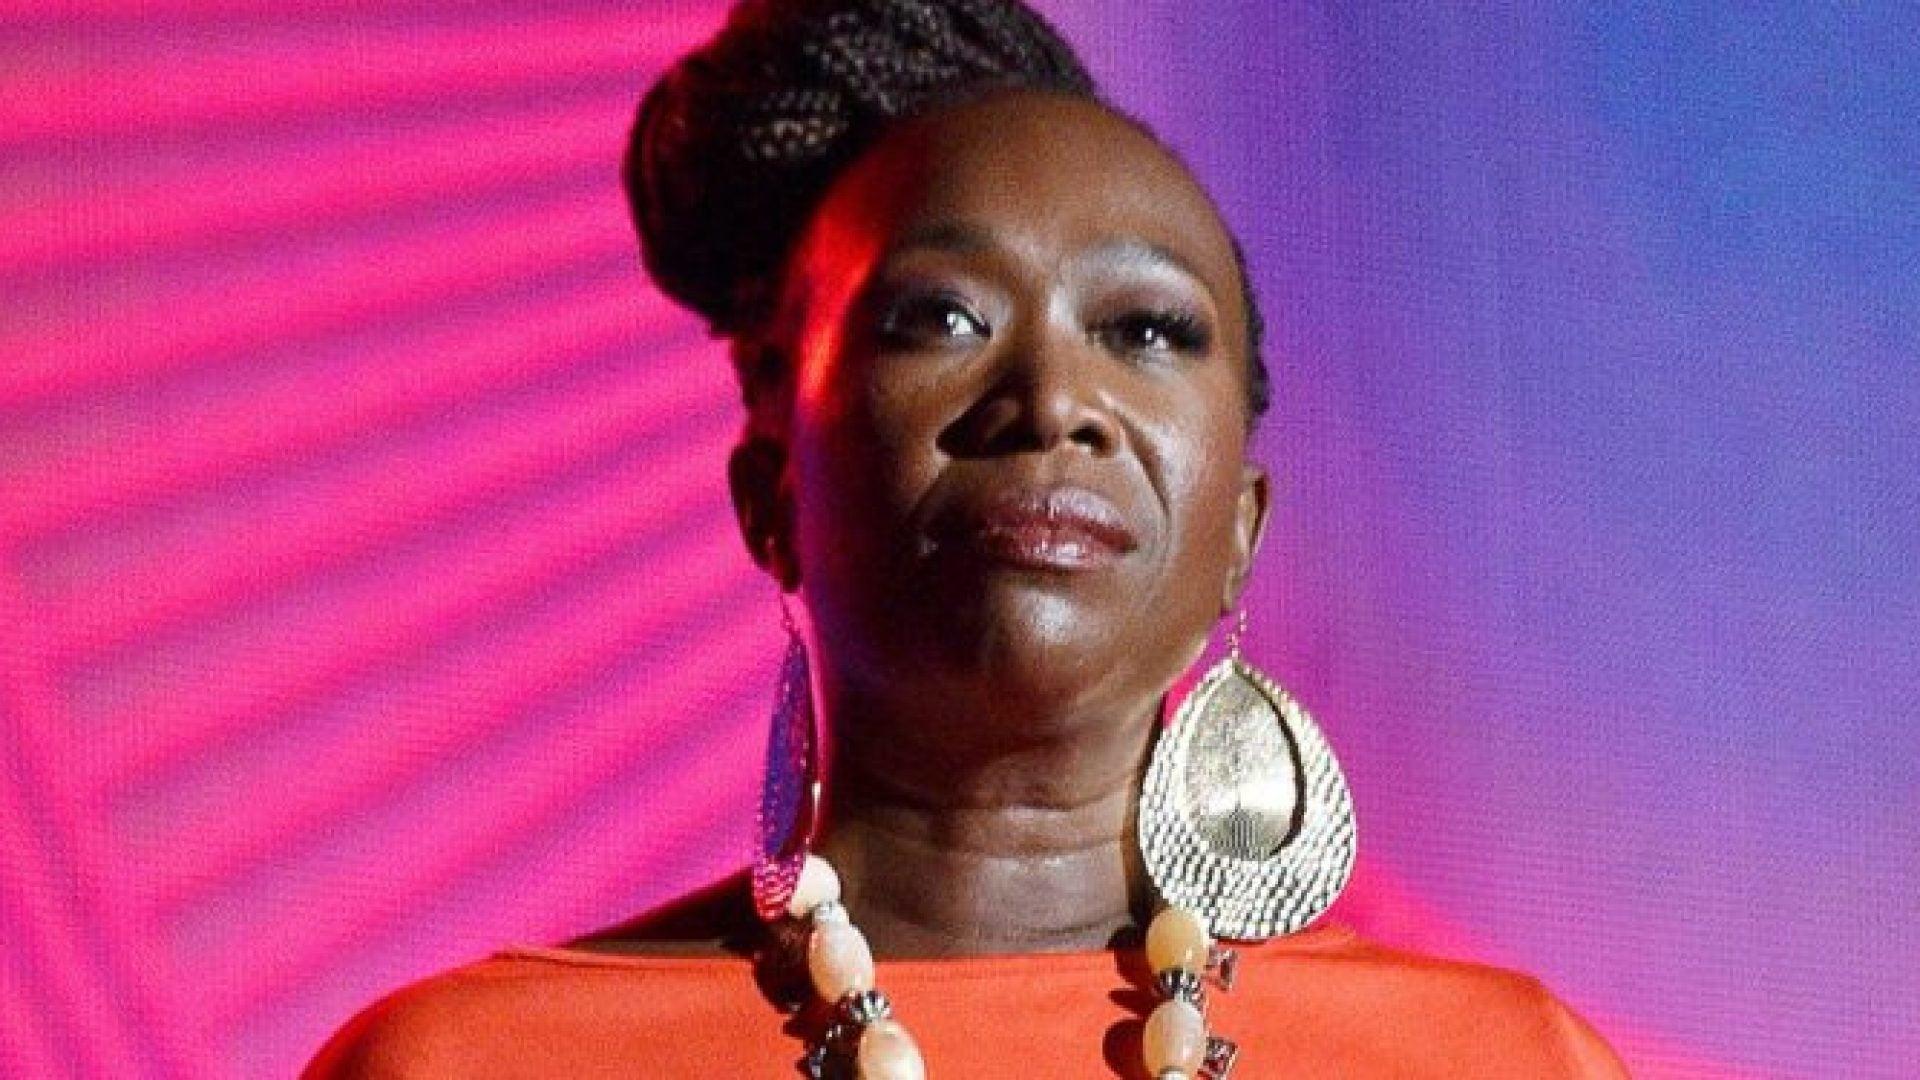 Watch Joy Reid's Powerful Speech On Racial Double Standard Following Capitol Attack